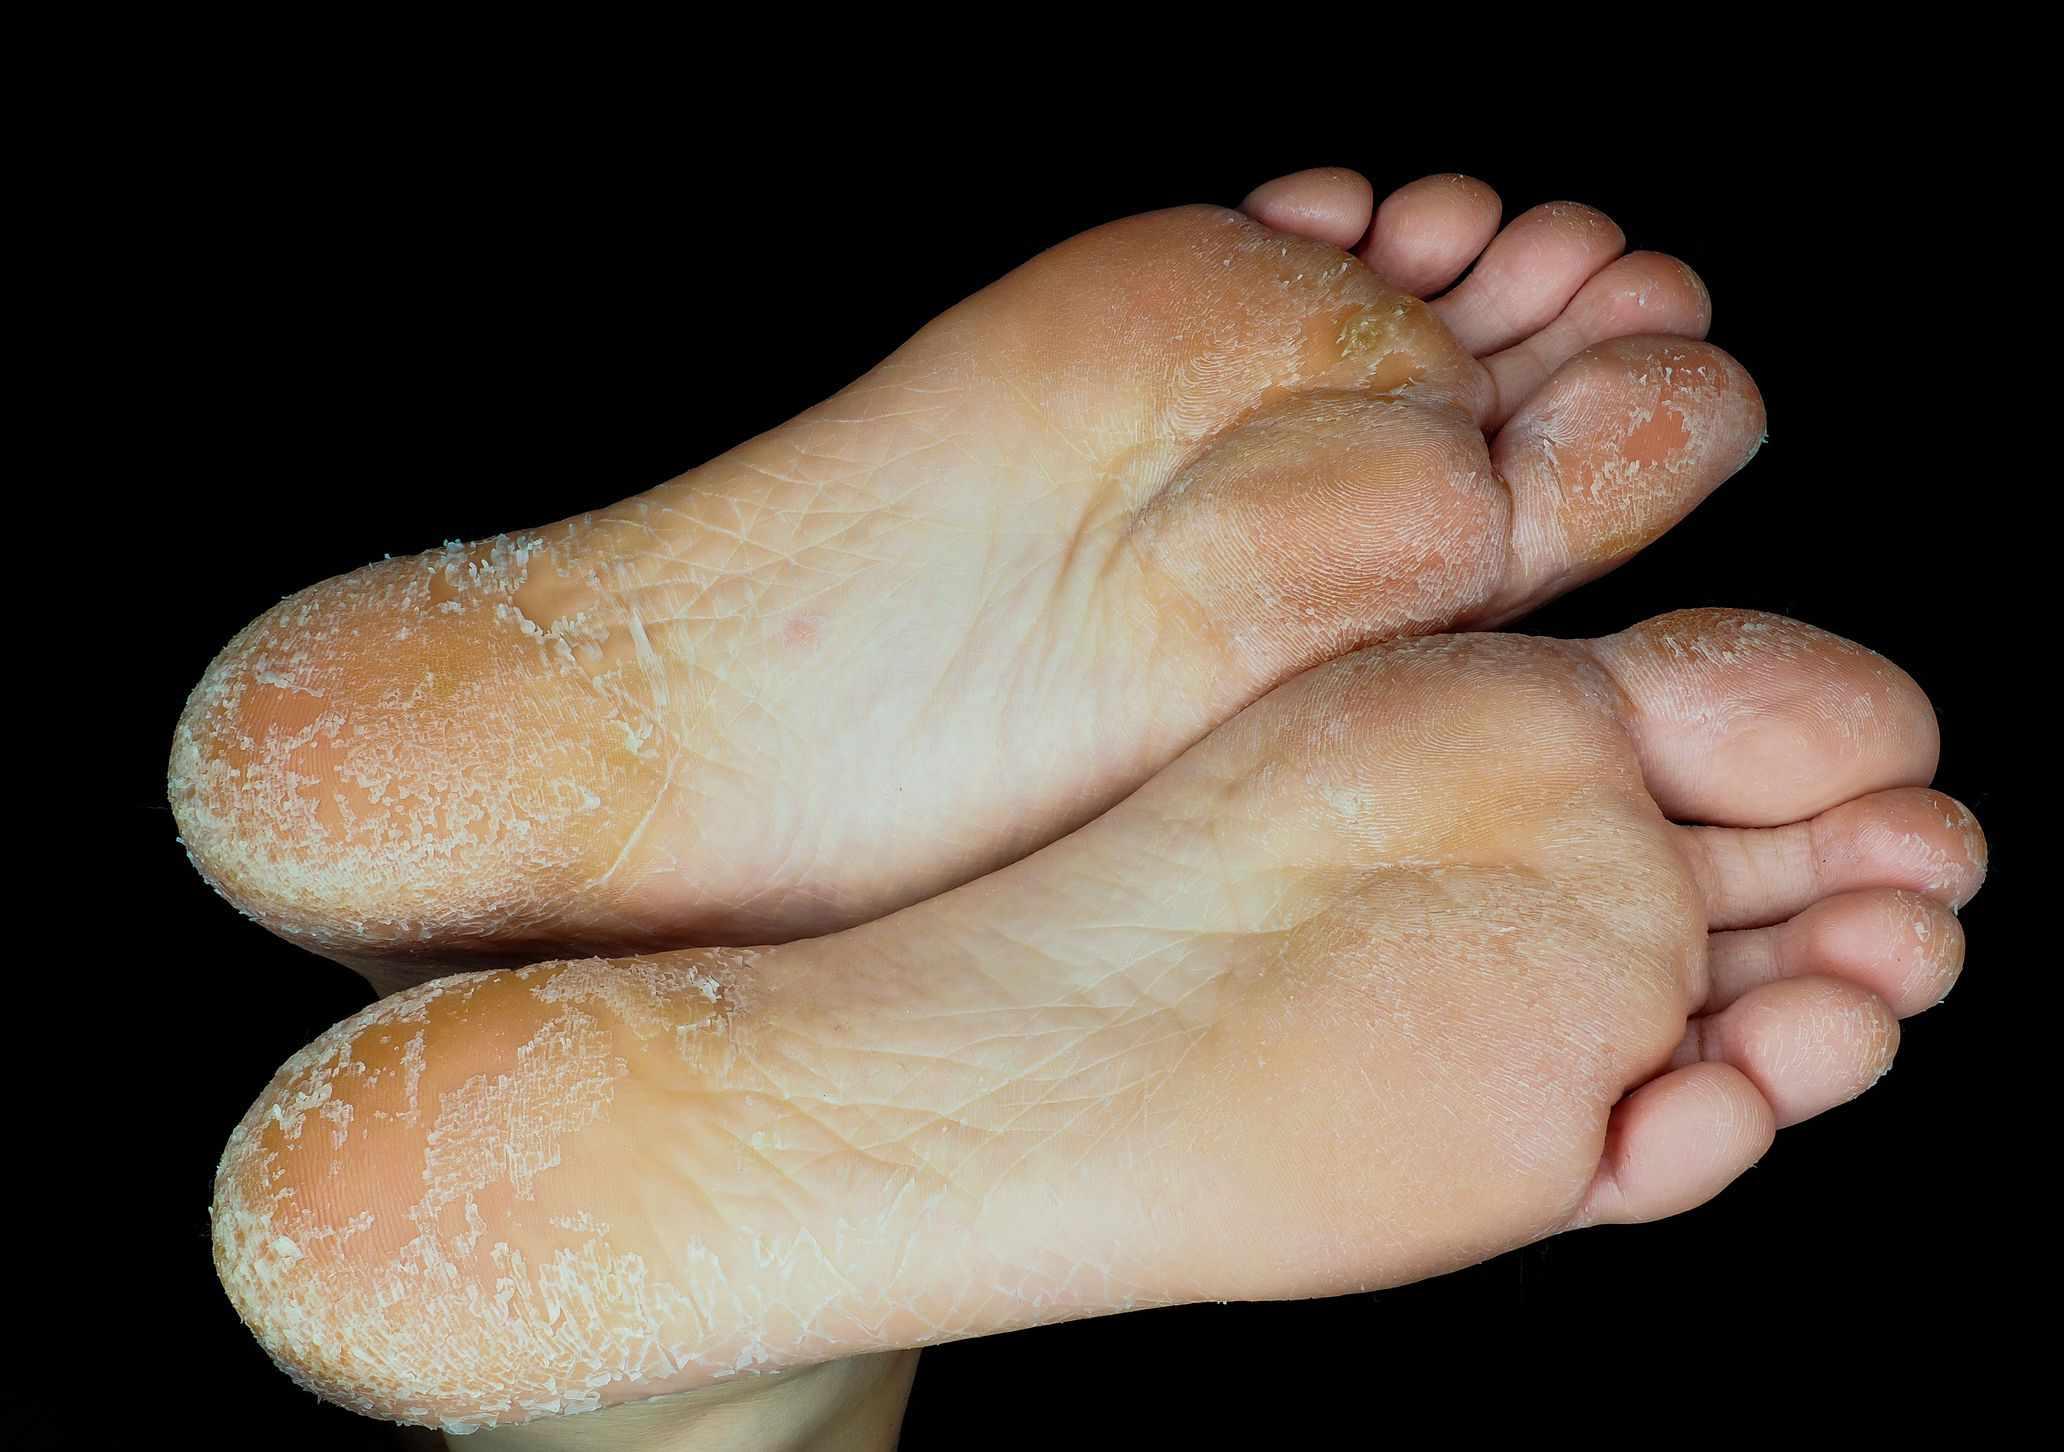 dry skin on soles of feet